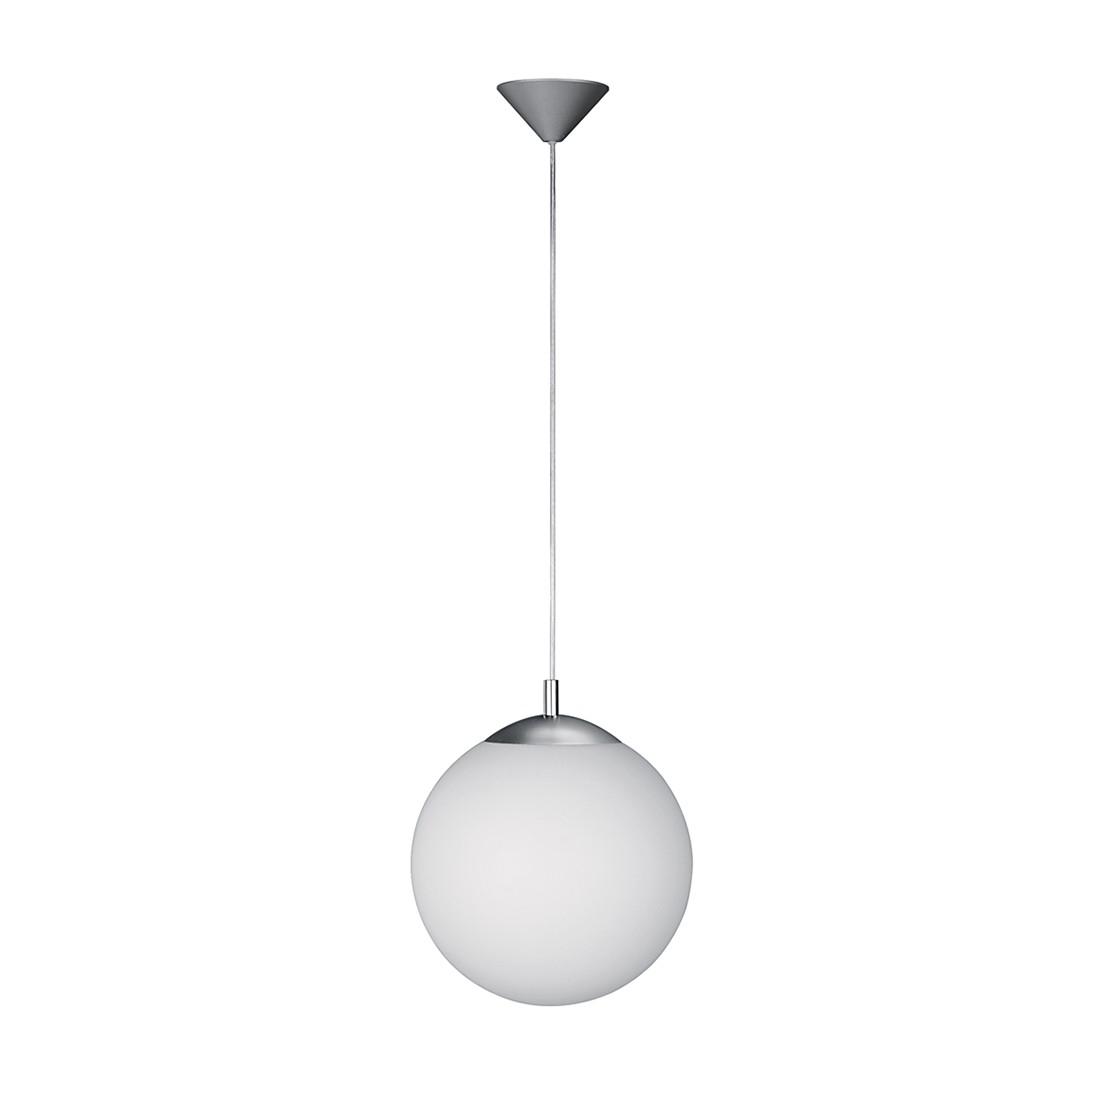 EEK A++, Pendelleuchte POINT – Metall/Glas – 1-flammig, Wofi jetzt bestellen